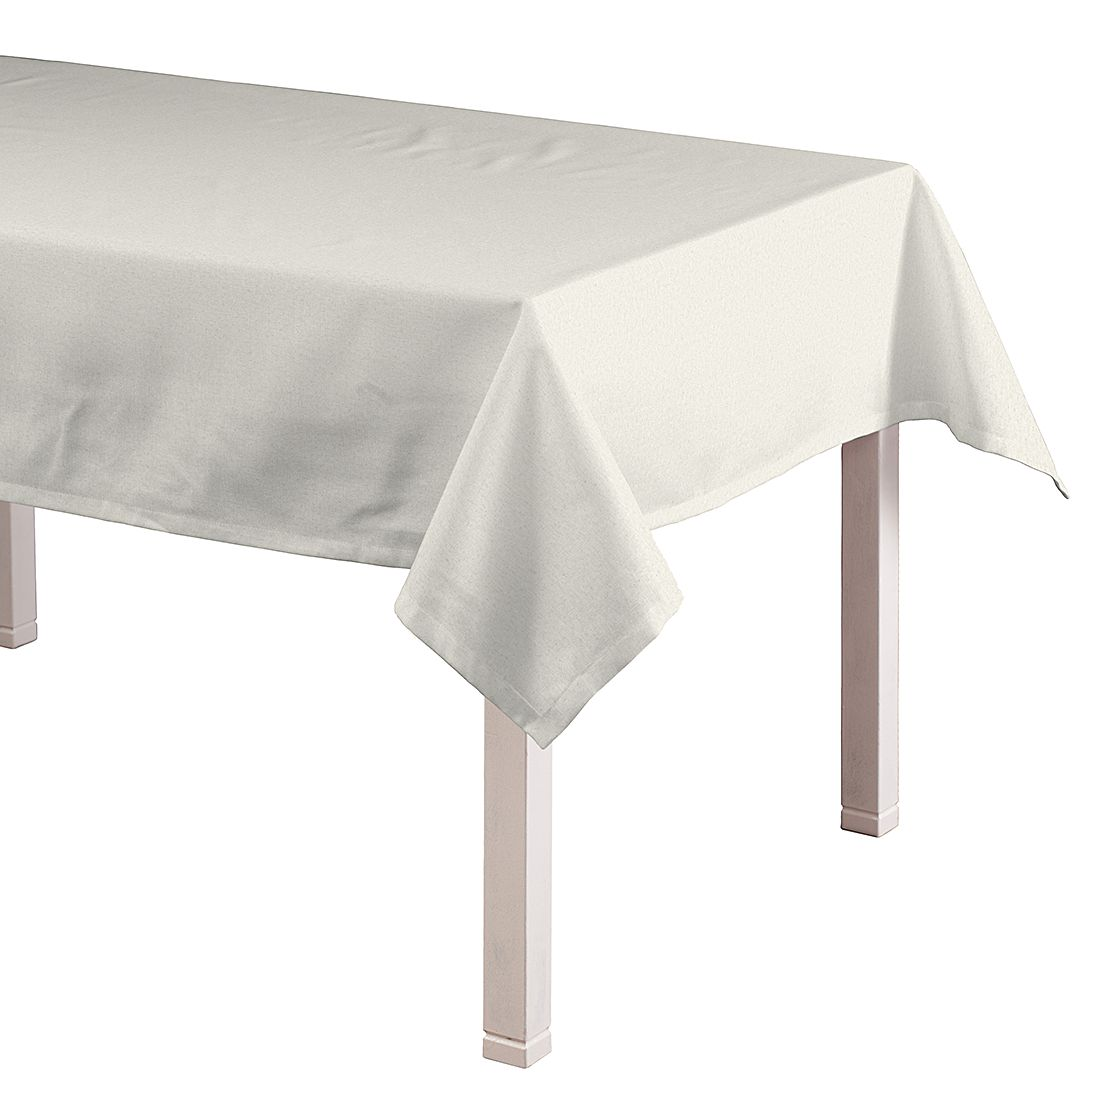 Tafelkleed Loneta - Crème - 130x160cm, Dekoria